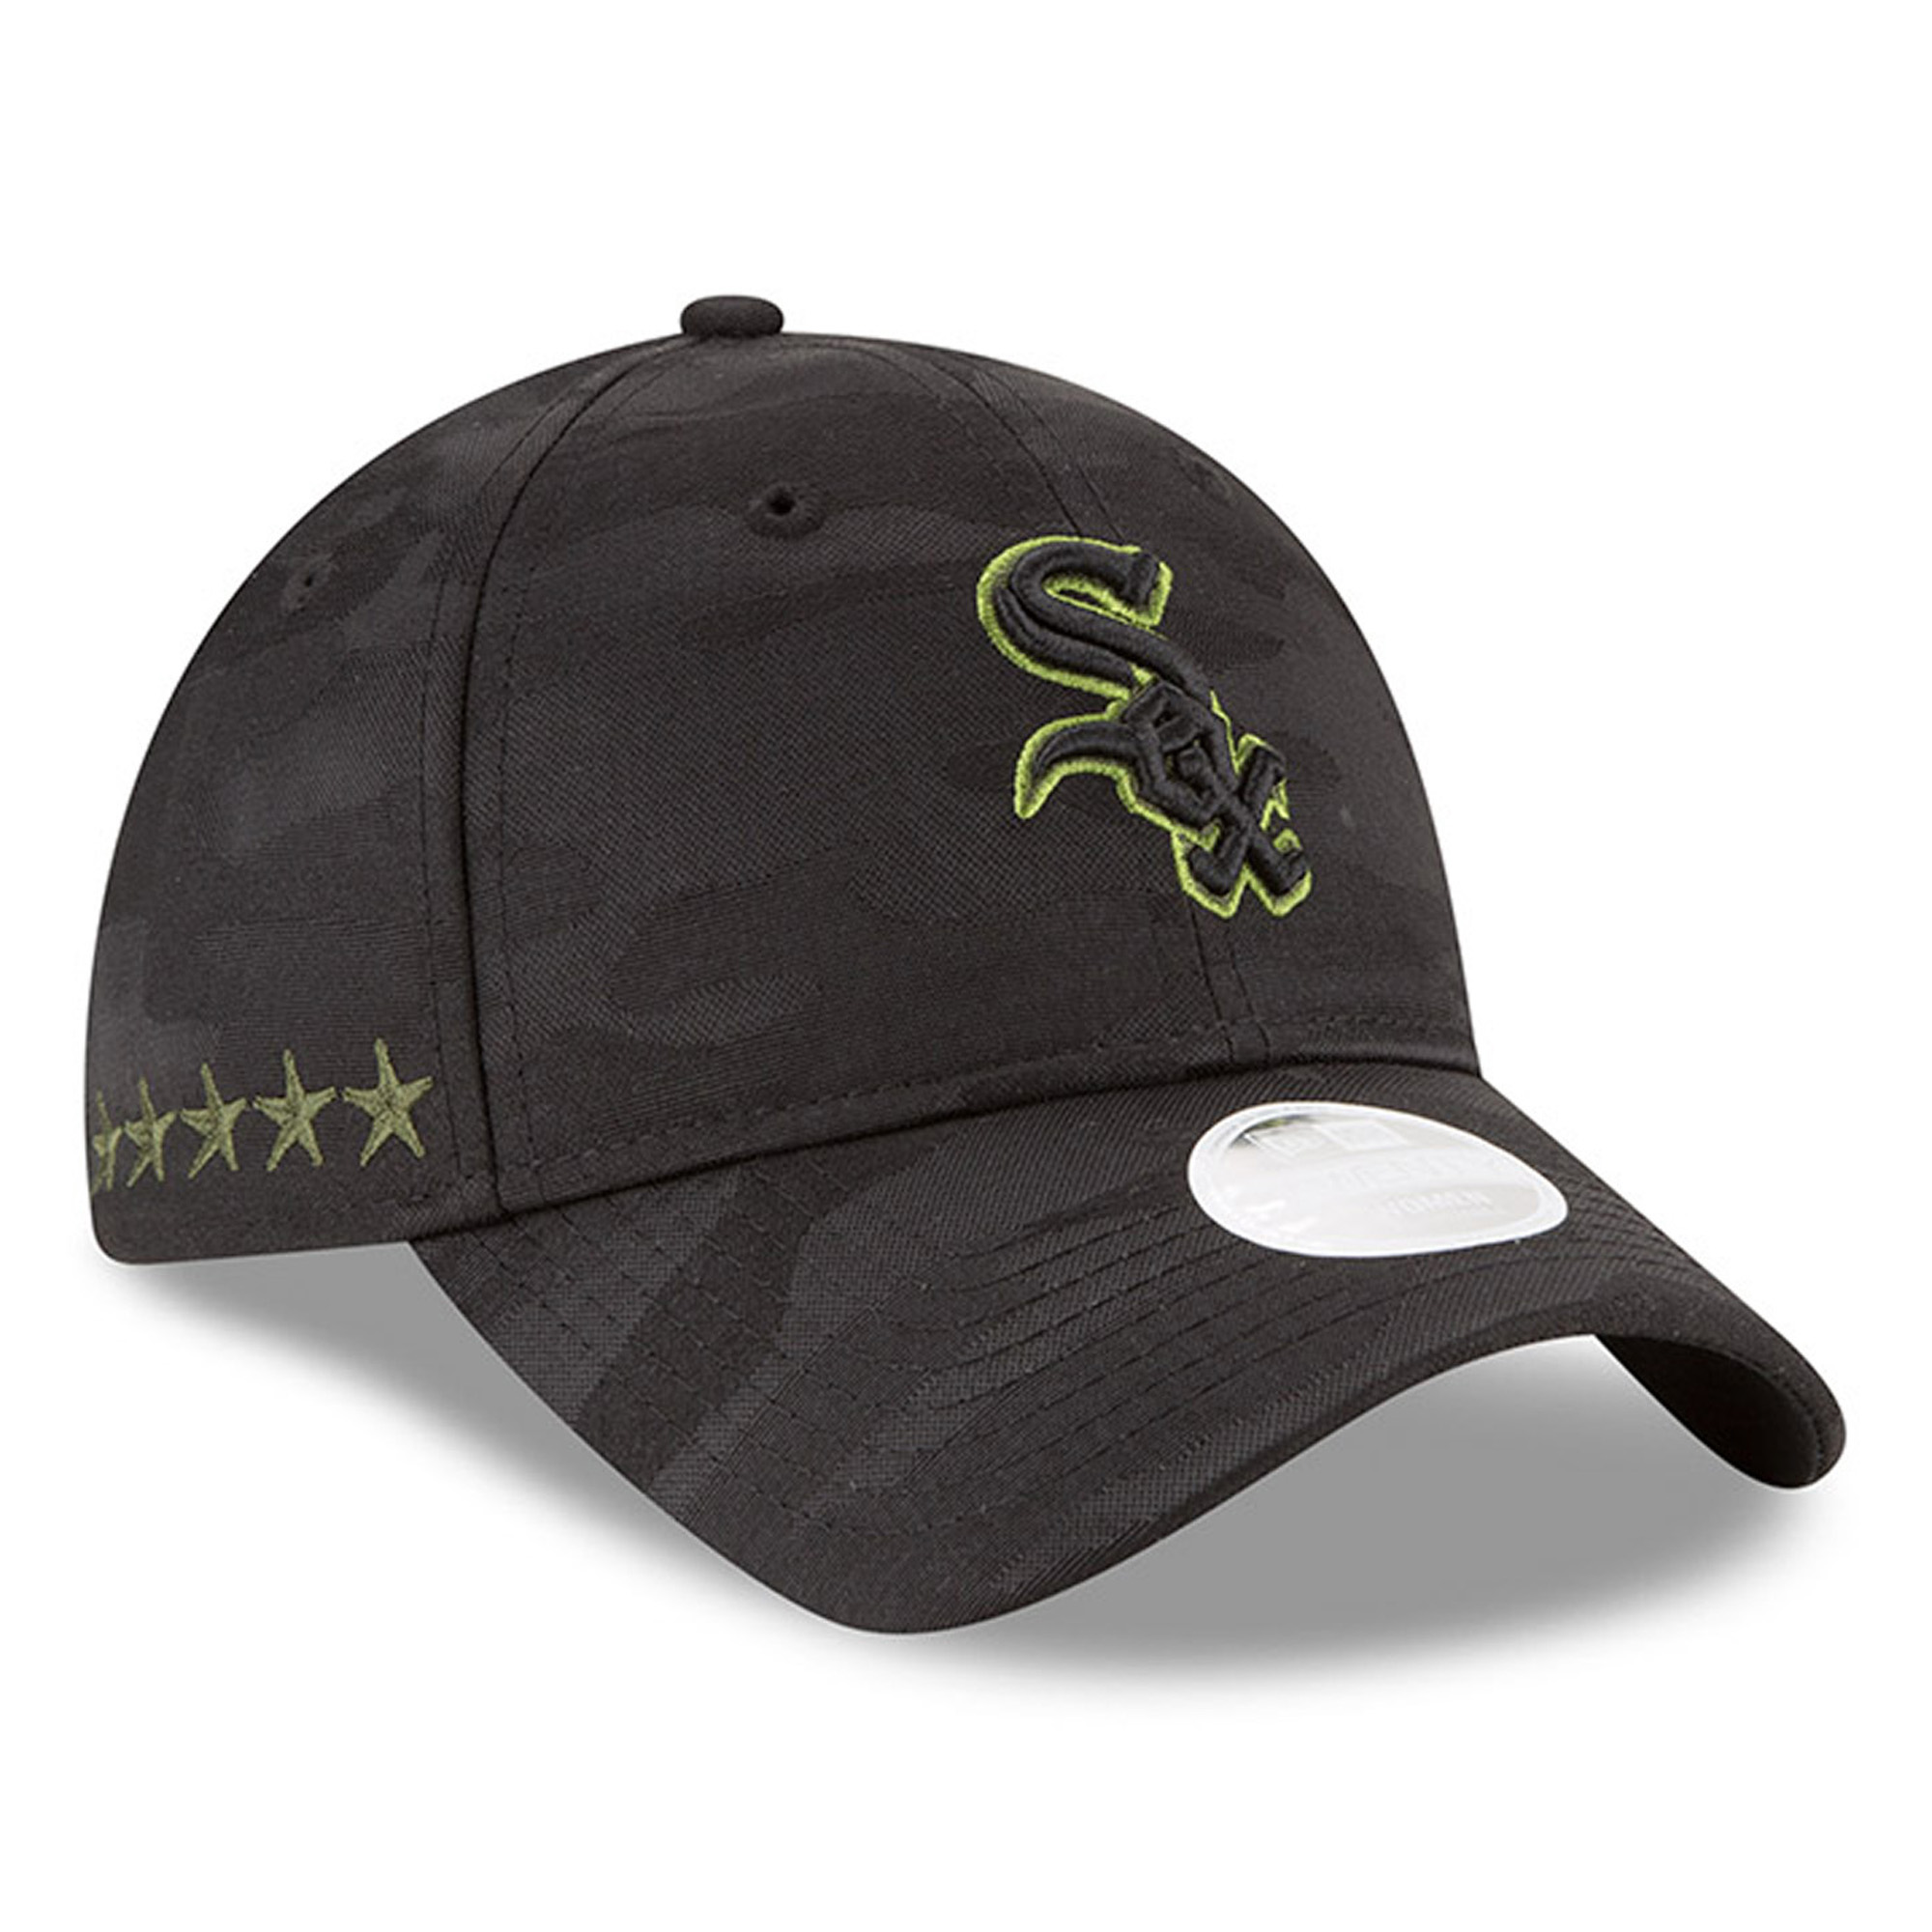 Chicago White Sox New Era Women's 2018 Memorial Day 9TWENTY Adjustable Hat - Black - OSFA